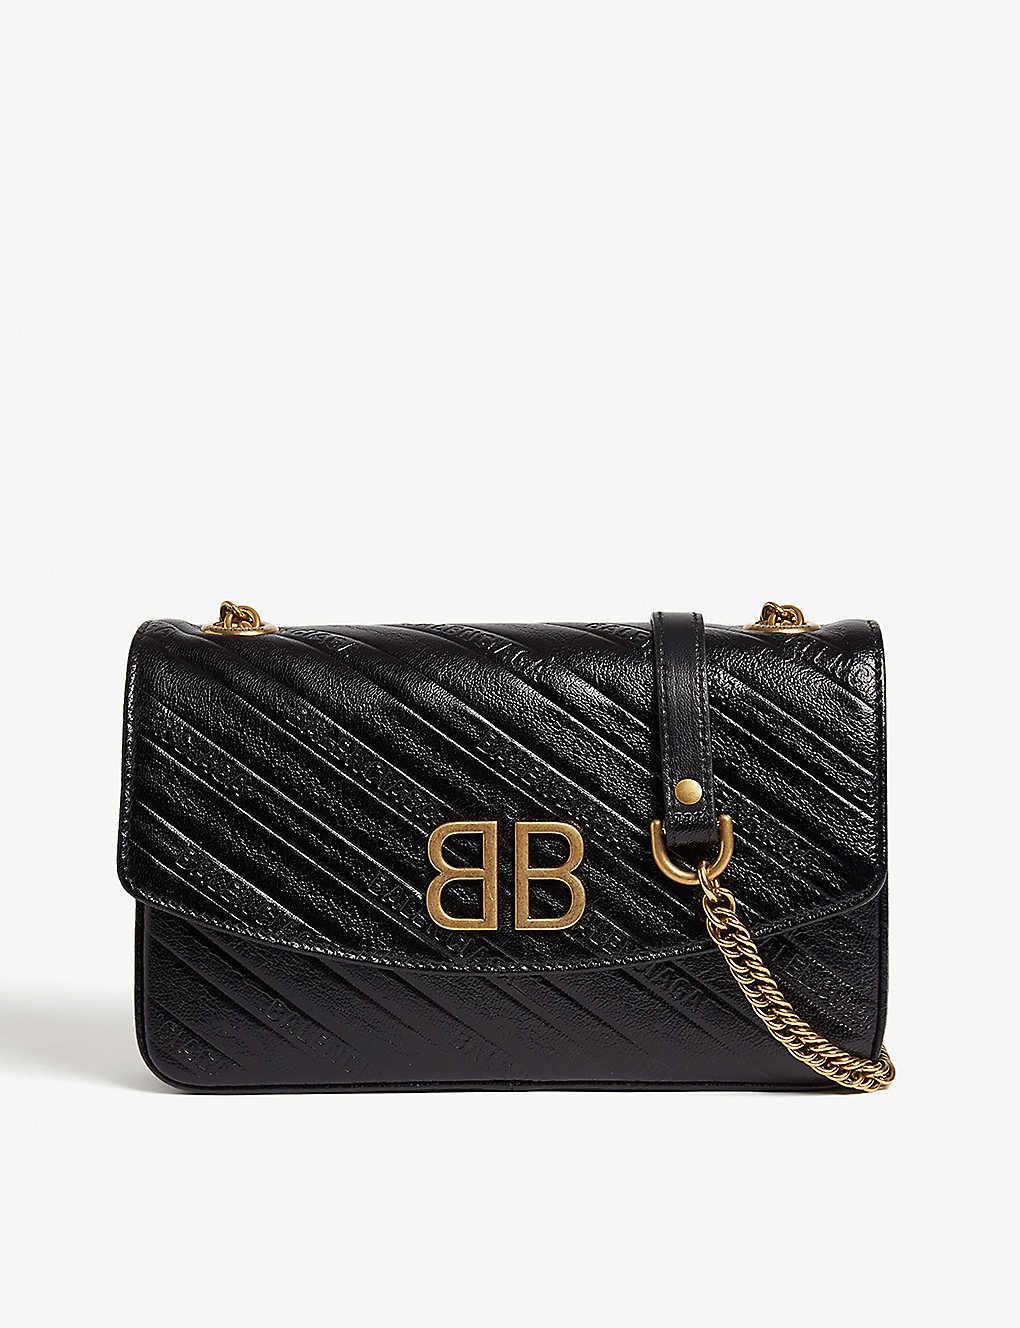 576a10c3edfca BALENCIAGA - BB Chain small leather shoulder bag | Selfridges.com